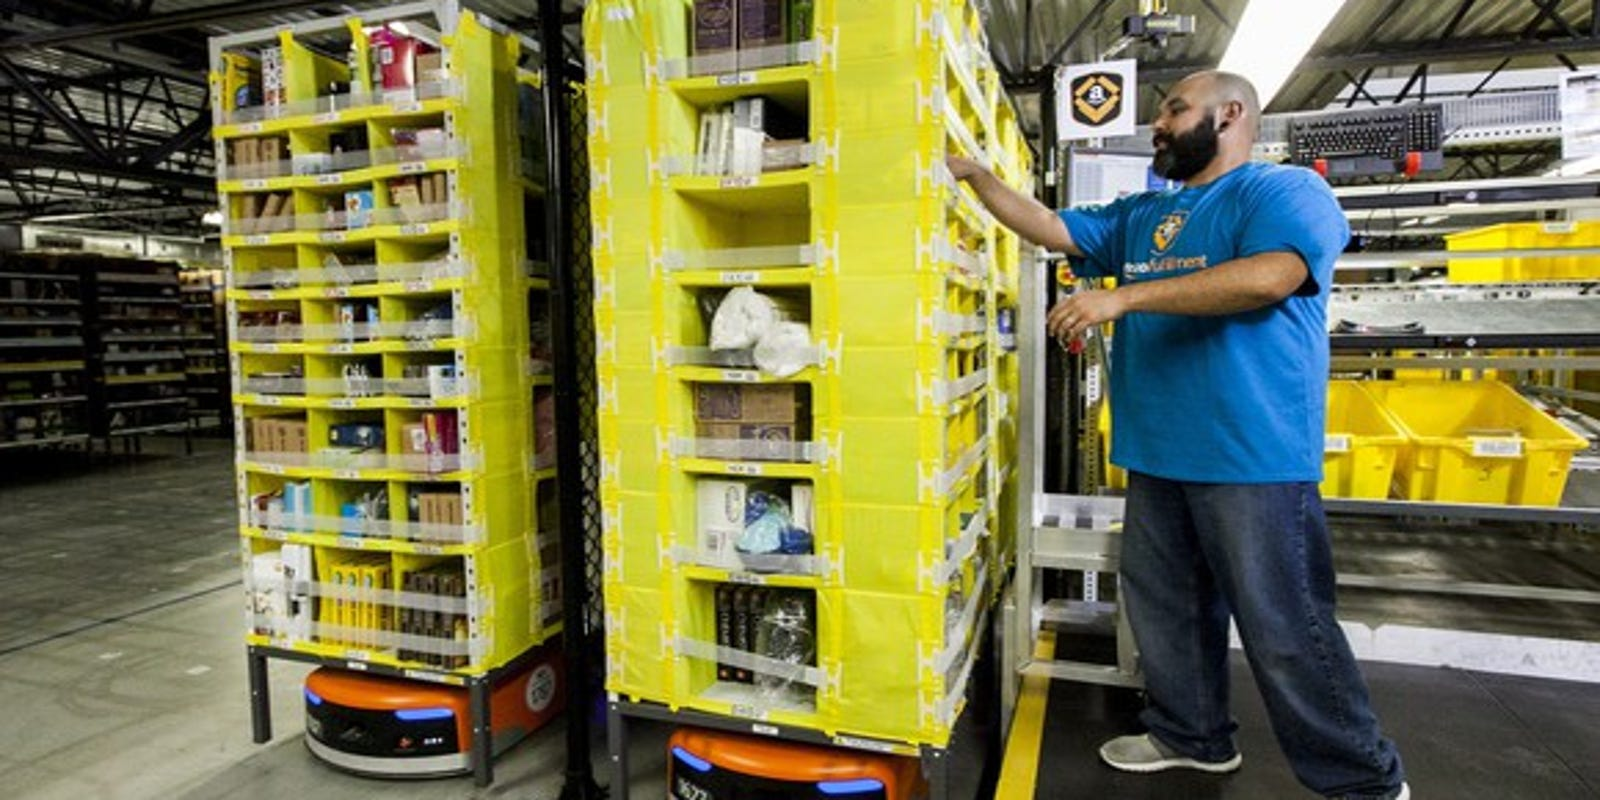 Amazon goes on warehouse hiring spree